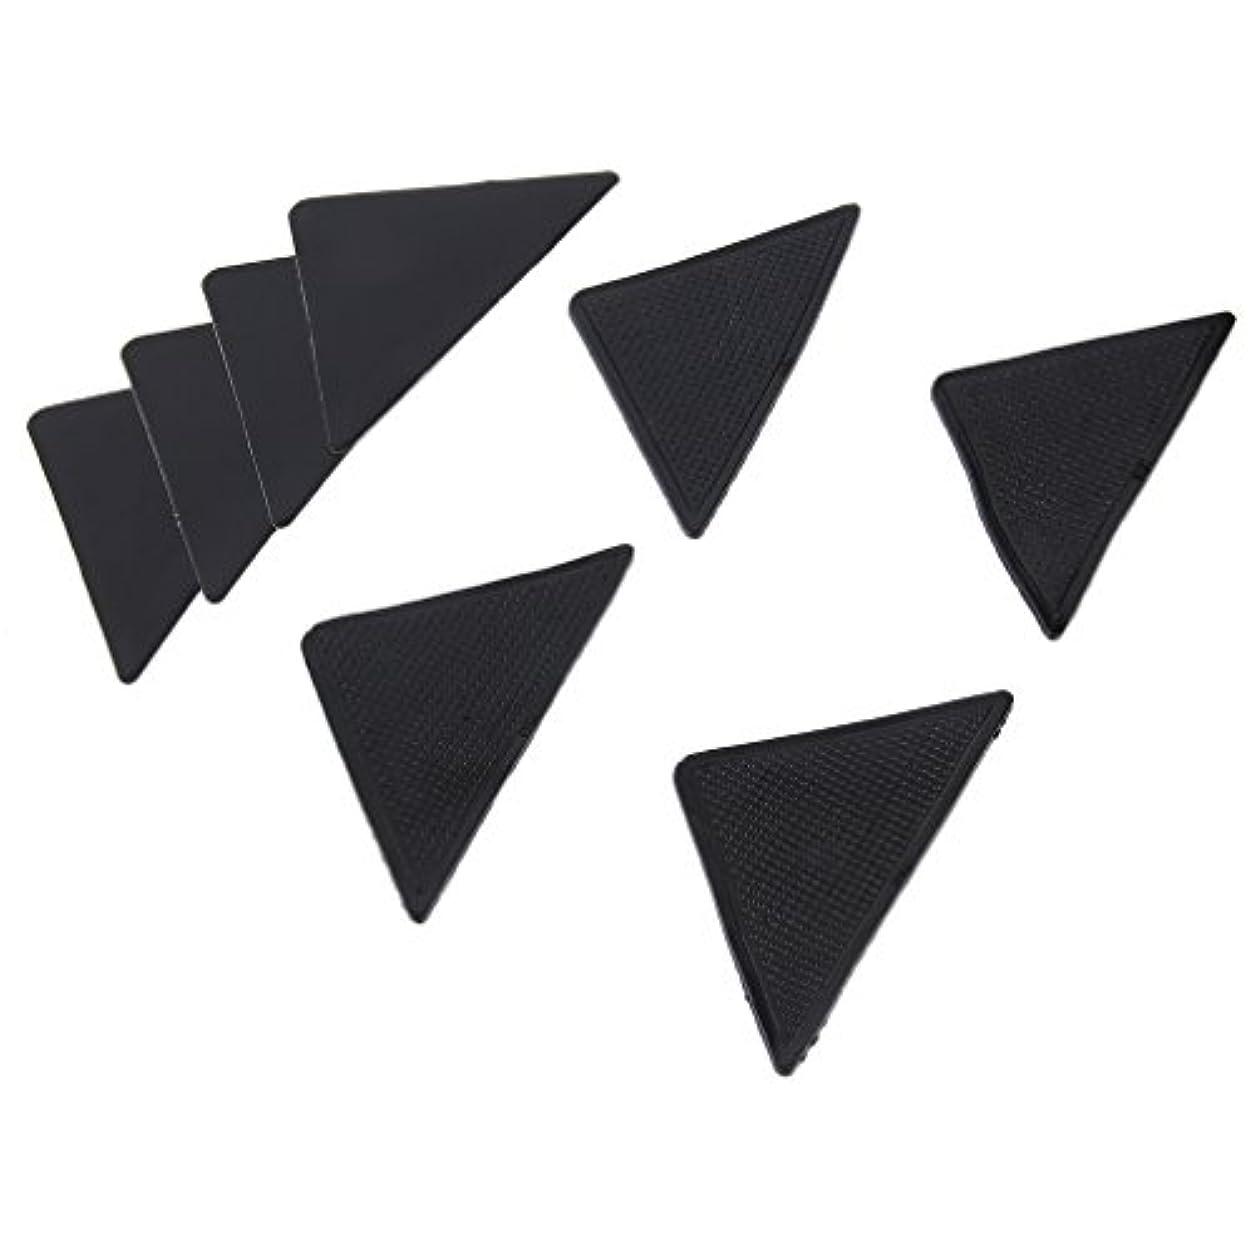 調停者柱溶岩4 pcs Rug Carpet Mat Grippers Non Slip Anti Skid Reusable Silicone Grip Pads